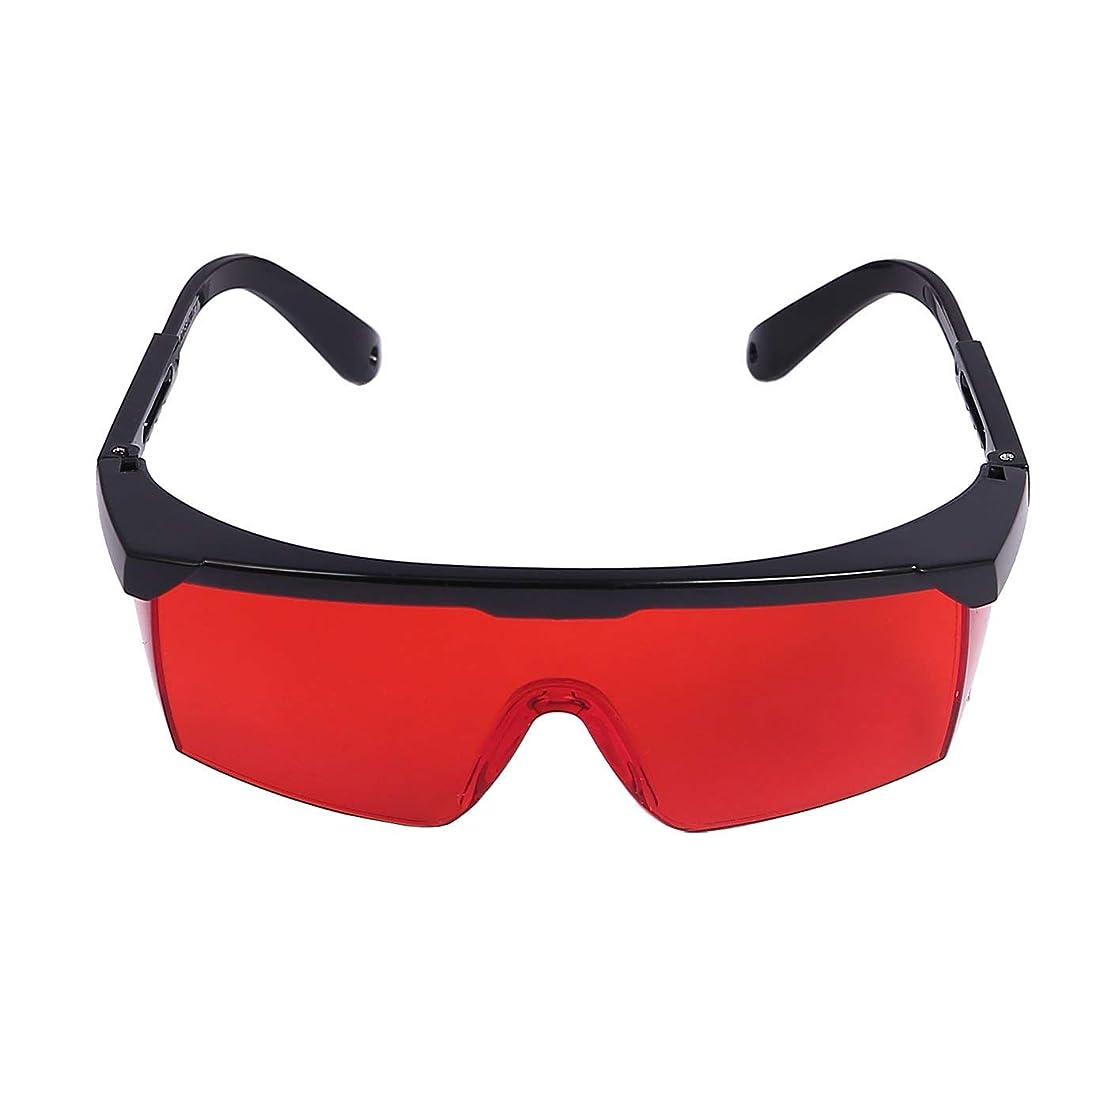 RAAKIMO 保護メガネ 安全眼鏡 レーザーからガード 青色のピコ秒レーザーペンにおすすめ